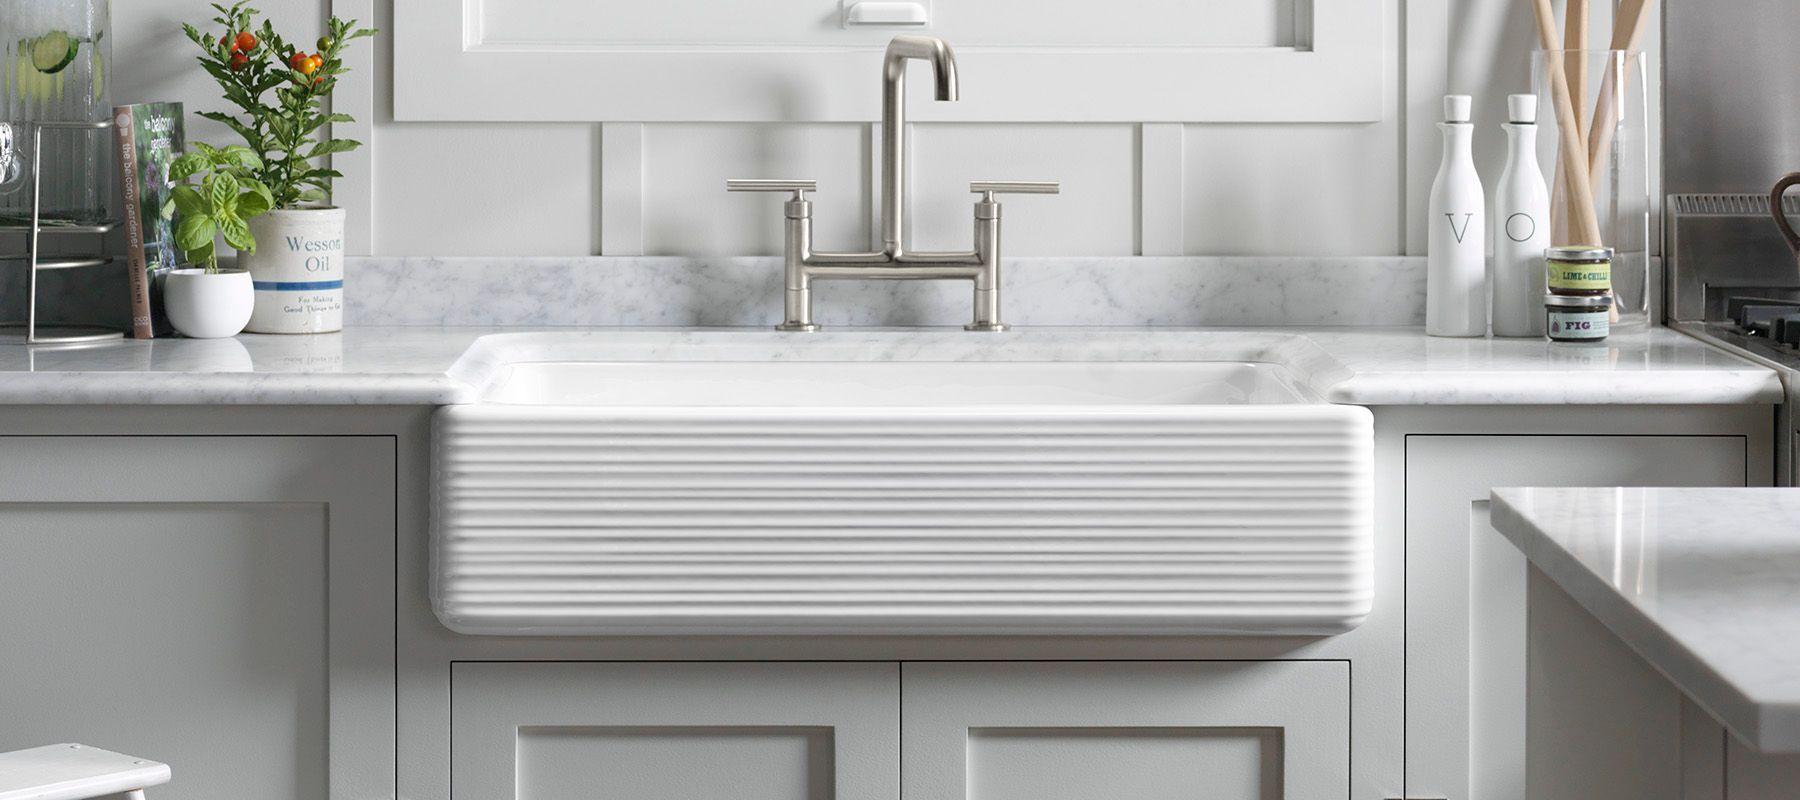 Number Of Basins 1 Fireclay KOHLER Enameled Cast Iron Kitchen Sinks |  Kitchen | KOHLER